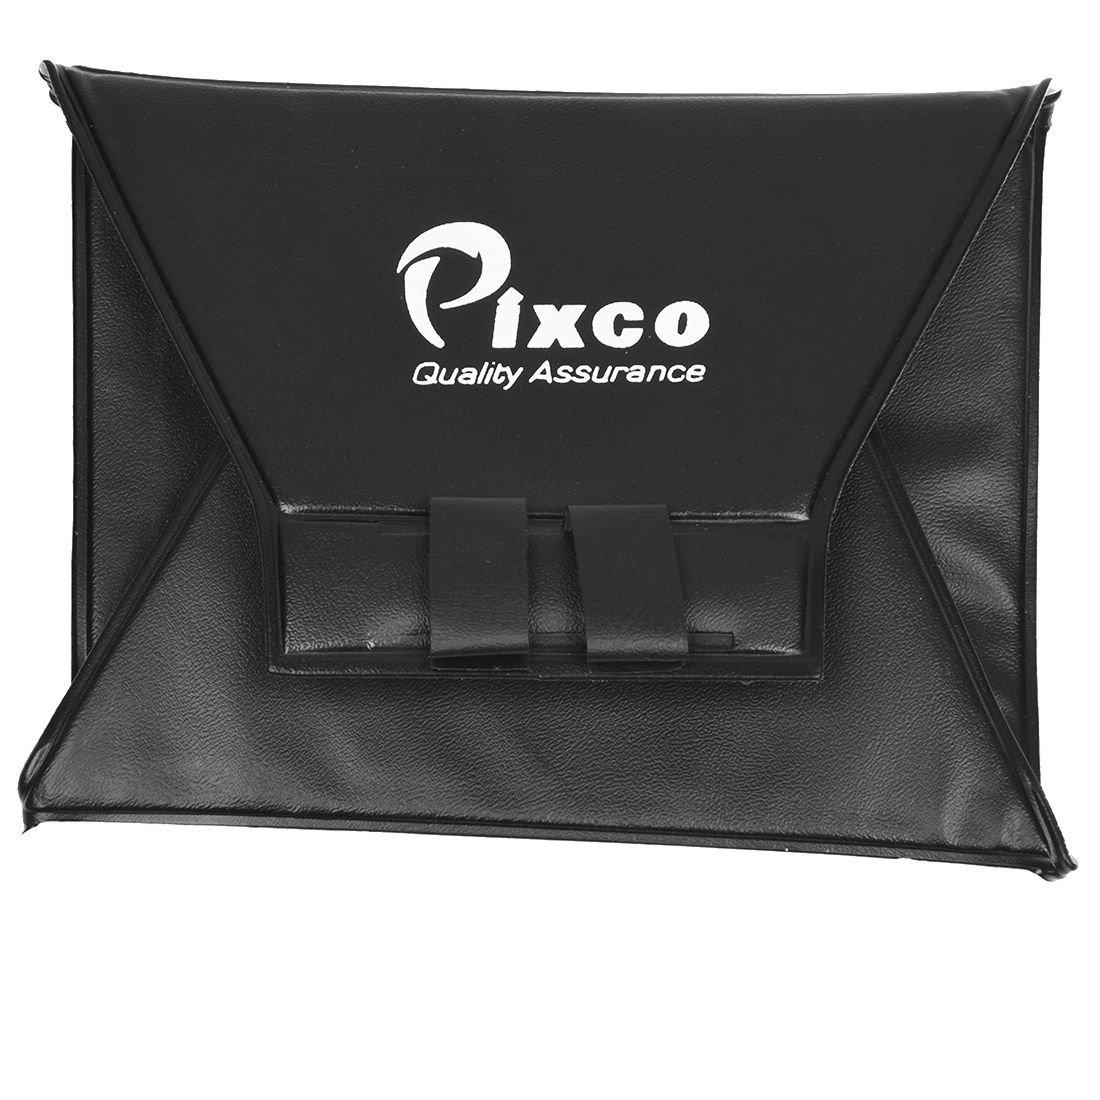 Softbox - Pixco Foldable 12X11cm Camera Flash Diffuser Softbox Flash Bounce flash for Nikon SB800 Canon 580EX